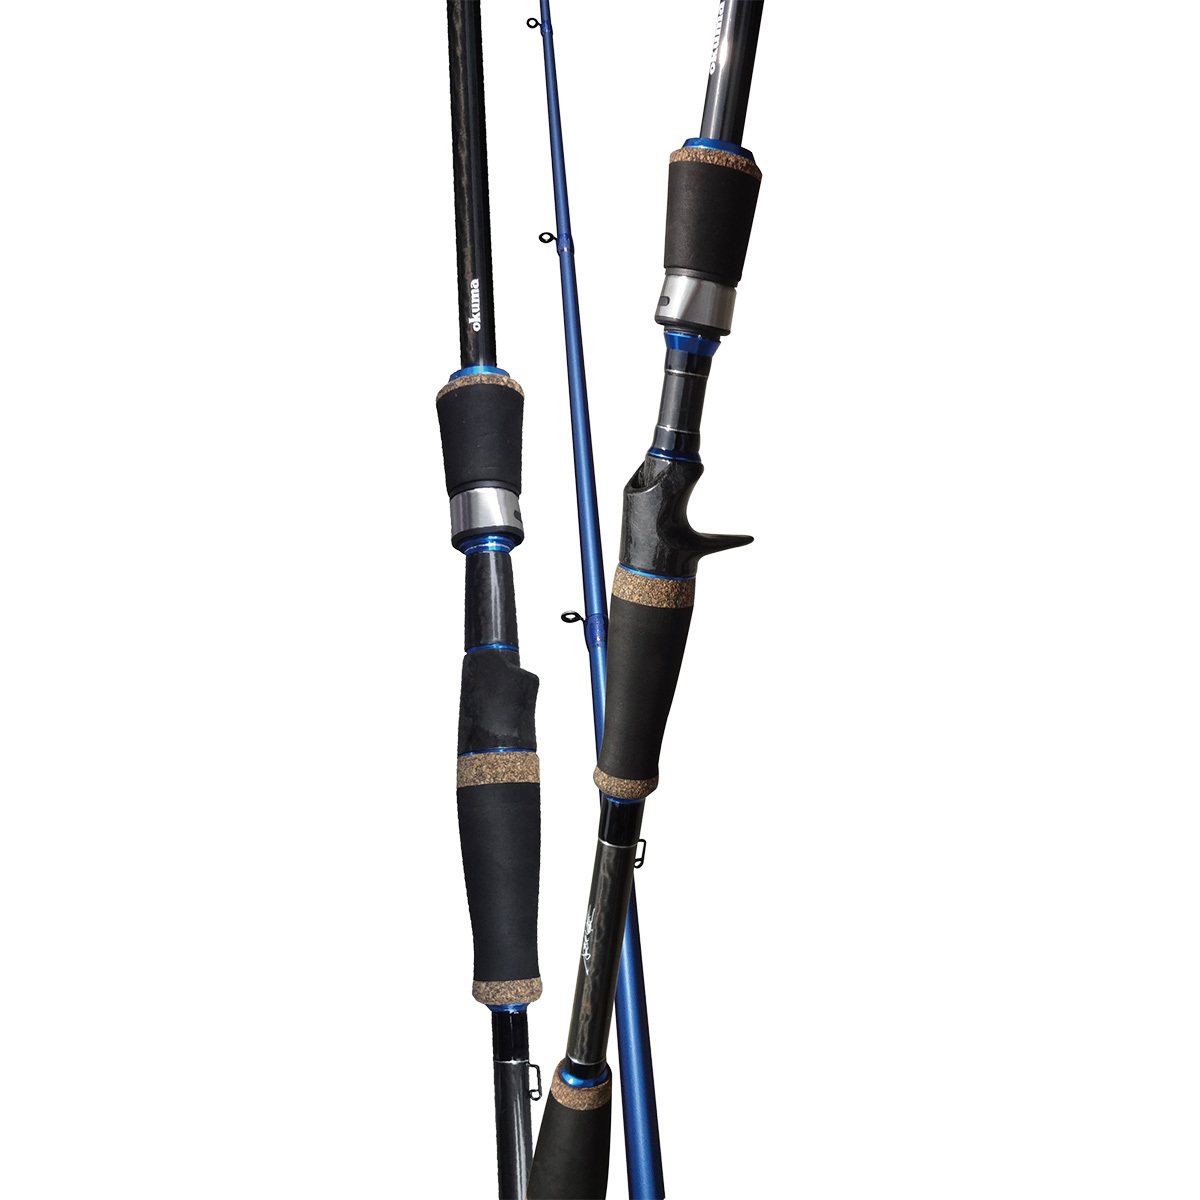 Okuma bass fishing rods fishbone knives for Bass pro fishing rods